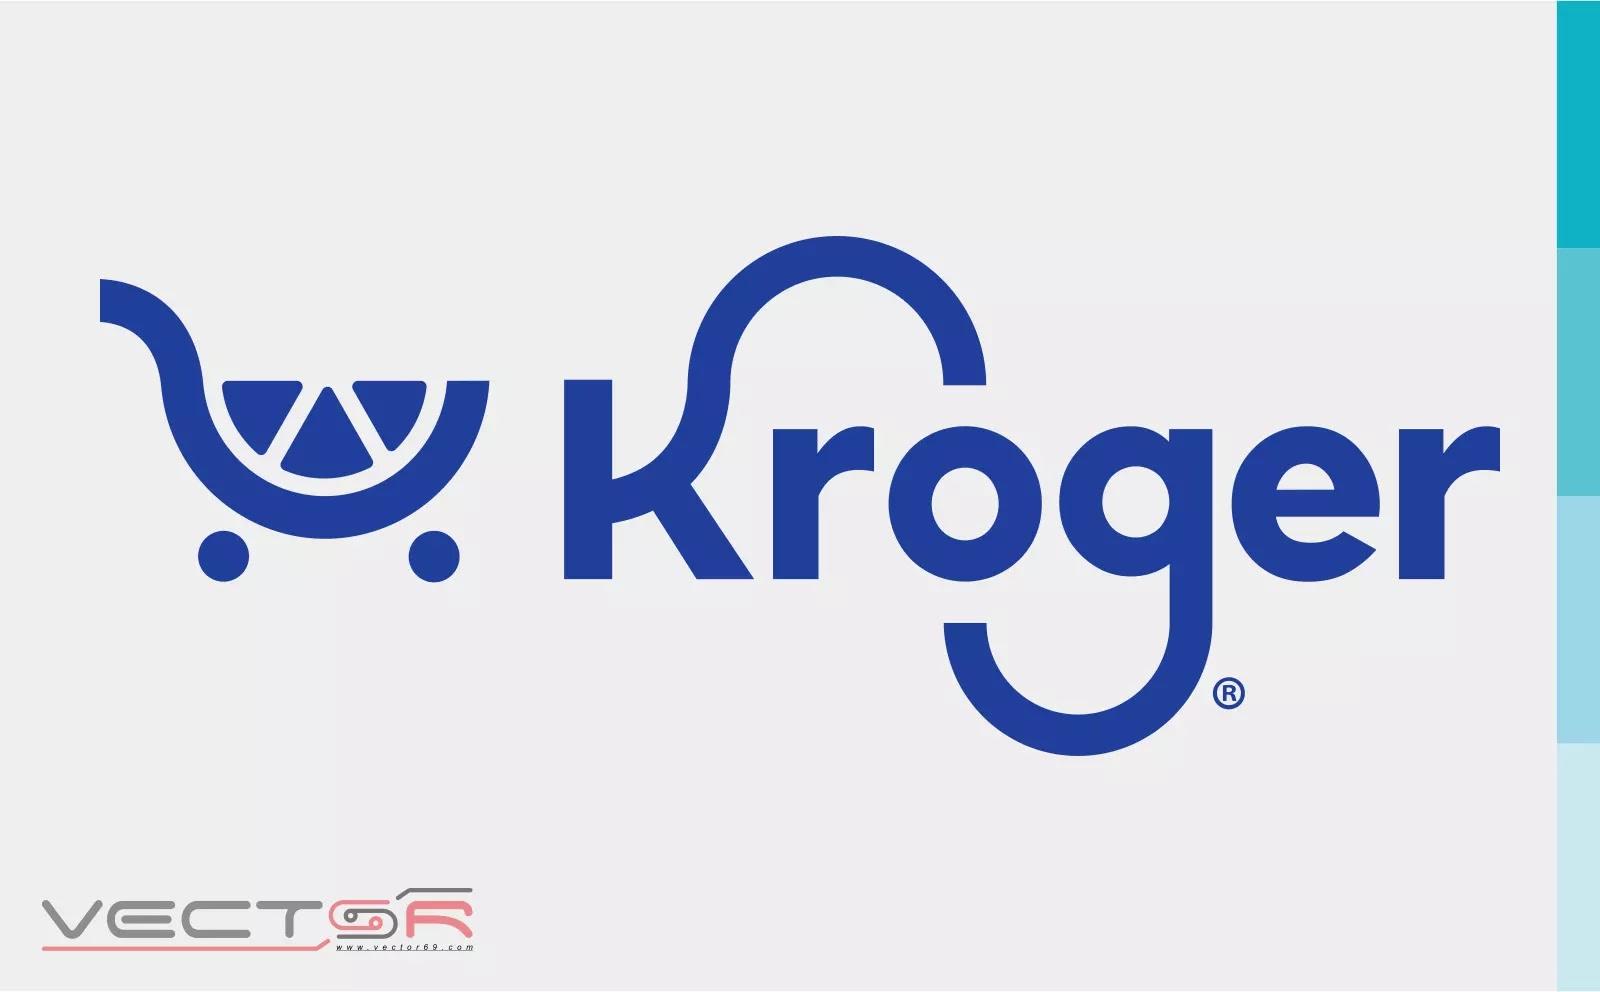 Kroger (2021) Logo - Download Vector File SVG (Scalable Vector Graphics)